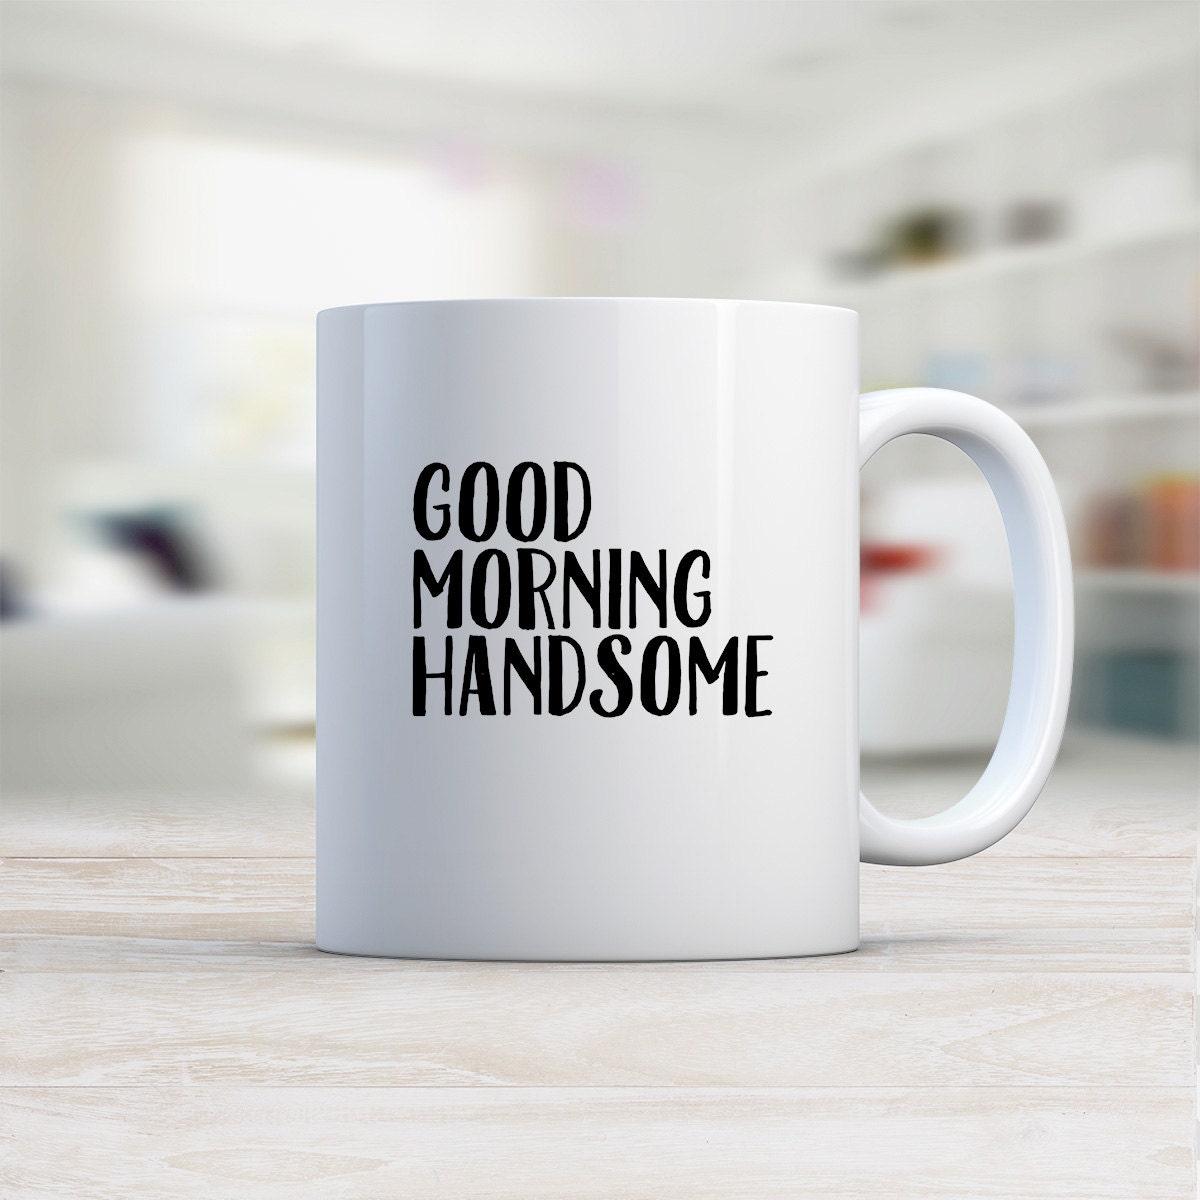 Good Morning Handsome Mug : Good morning handsome coffee mug oz ceramic